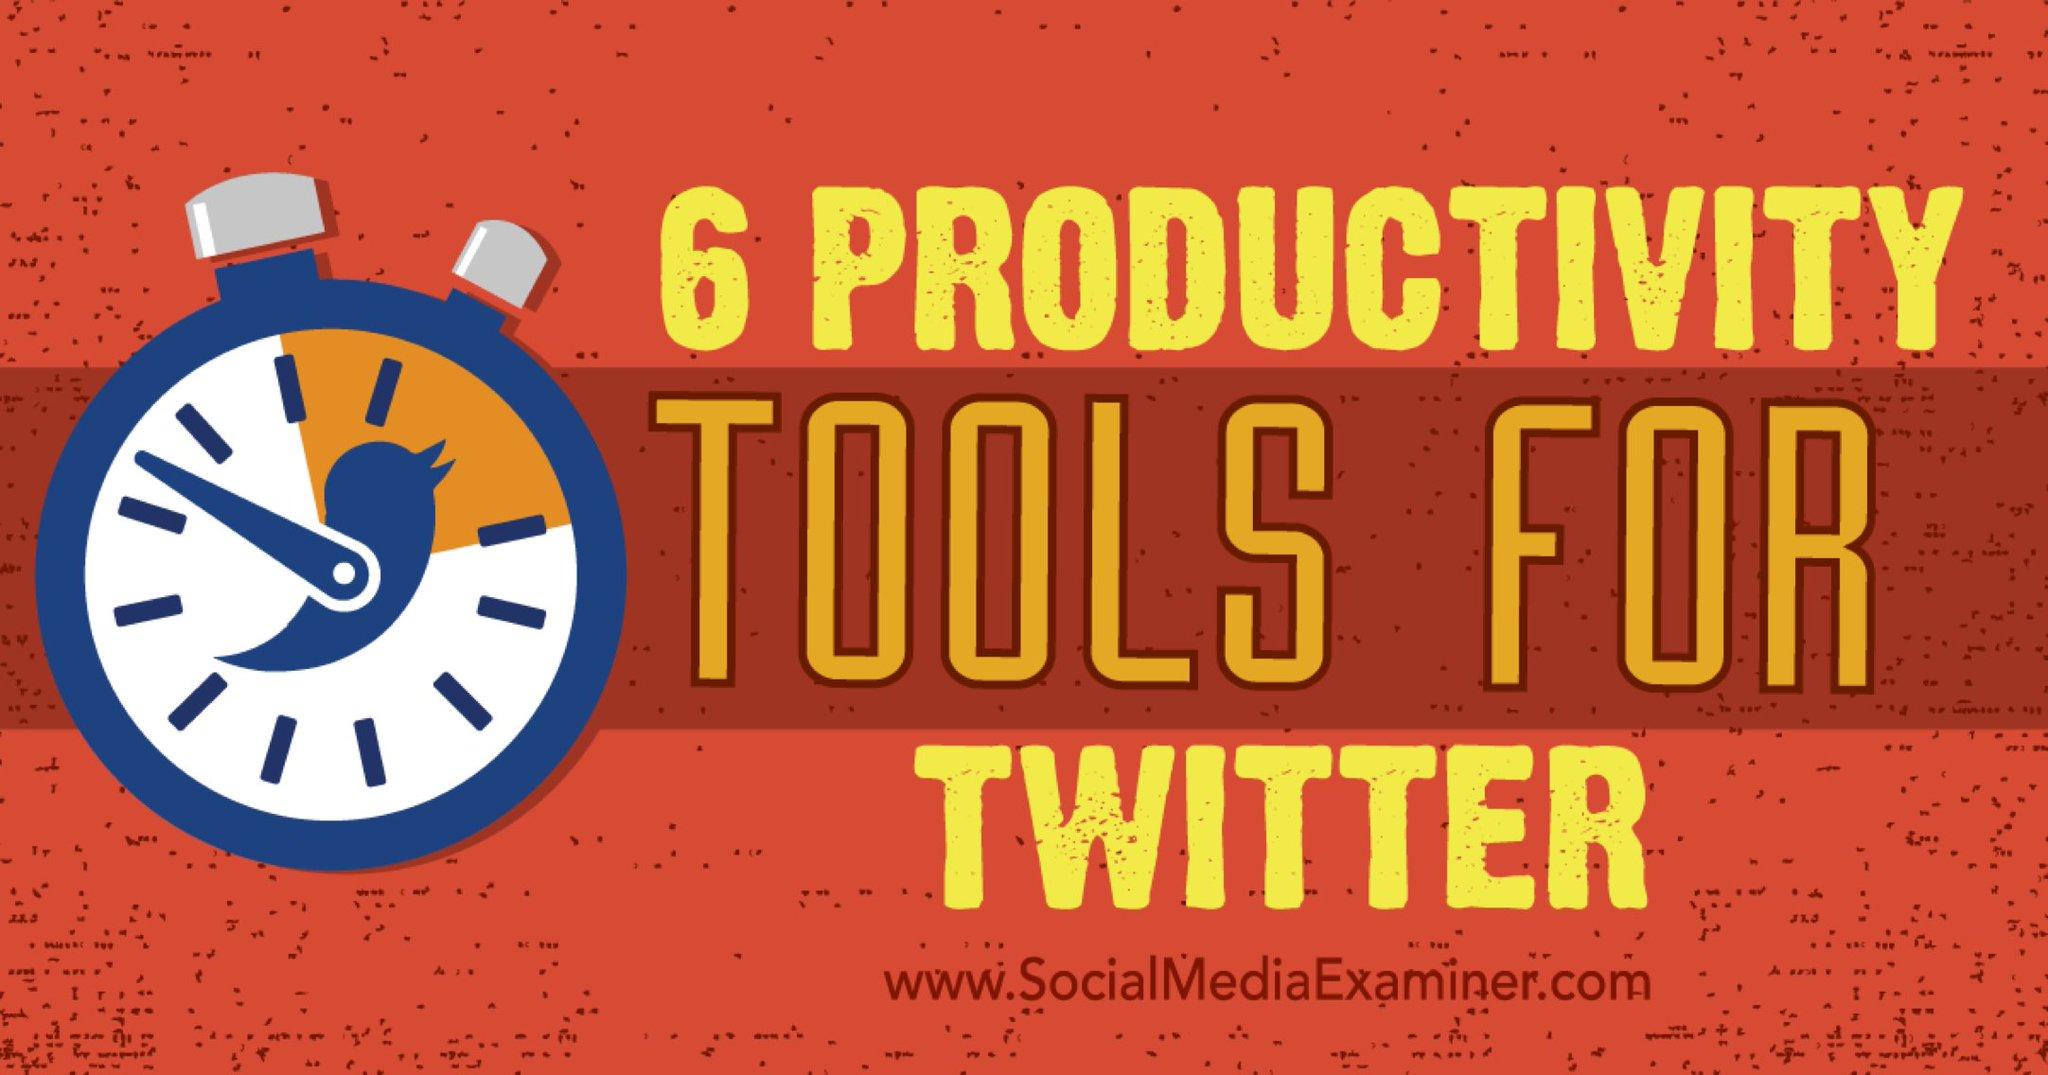 6 Productivity Tools for Twitter https://t.co/TRsMM9ltRN via @iagdotme #TwitterSmarter https://t.co/6EfCpYD9w3